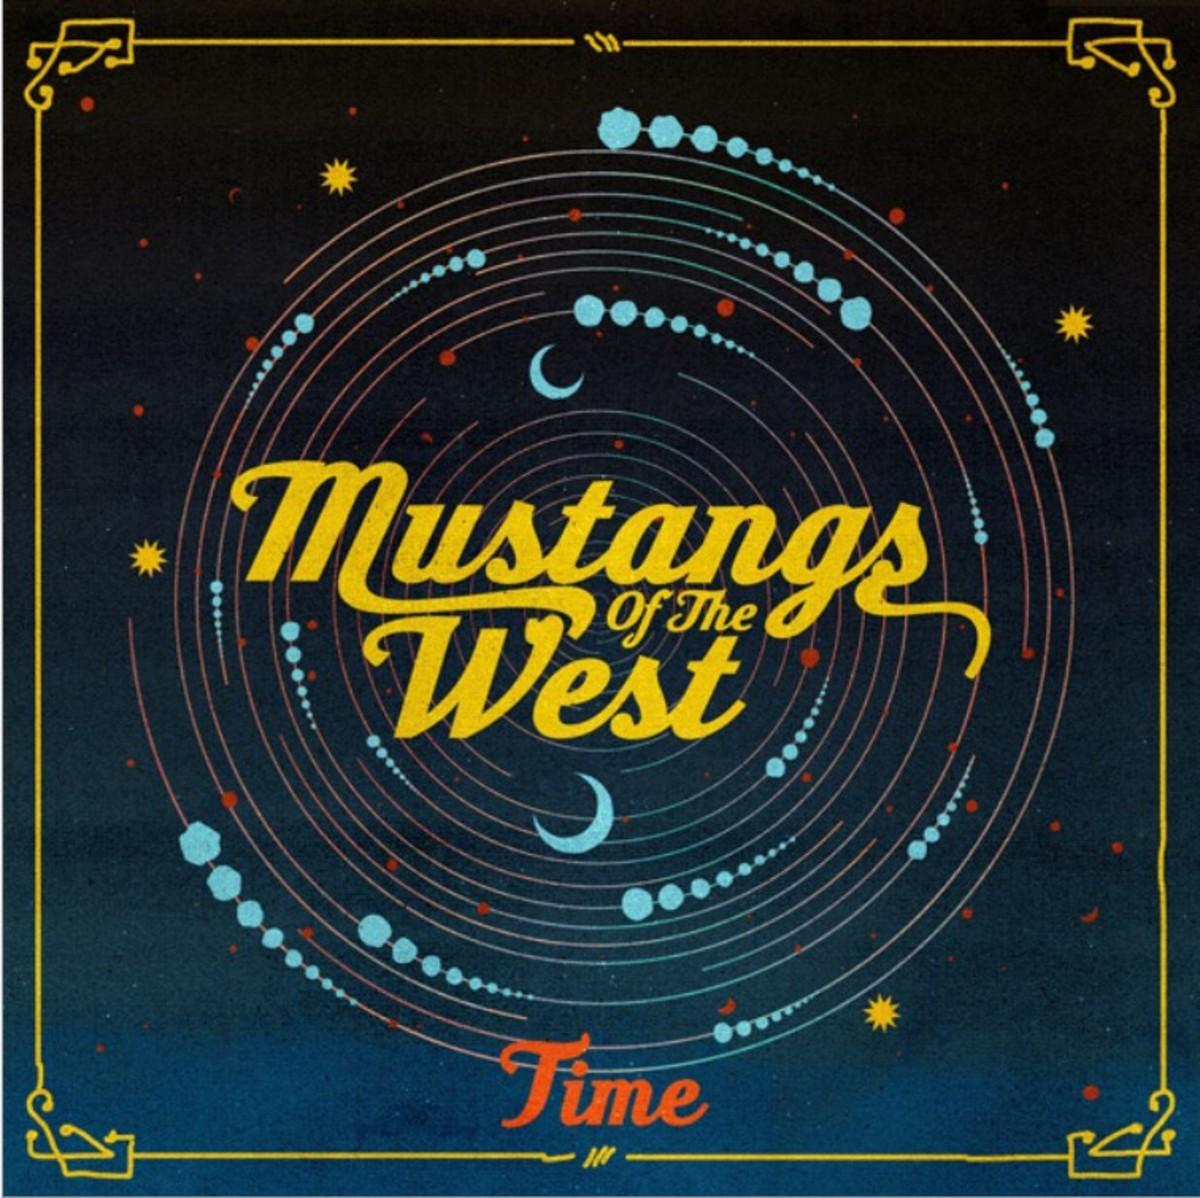 Mustangs Time